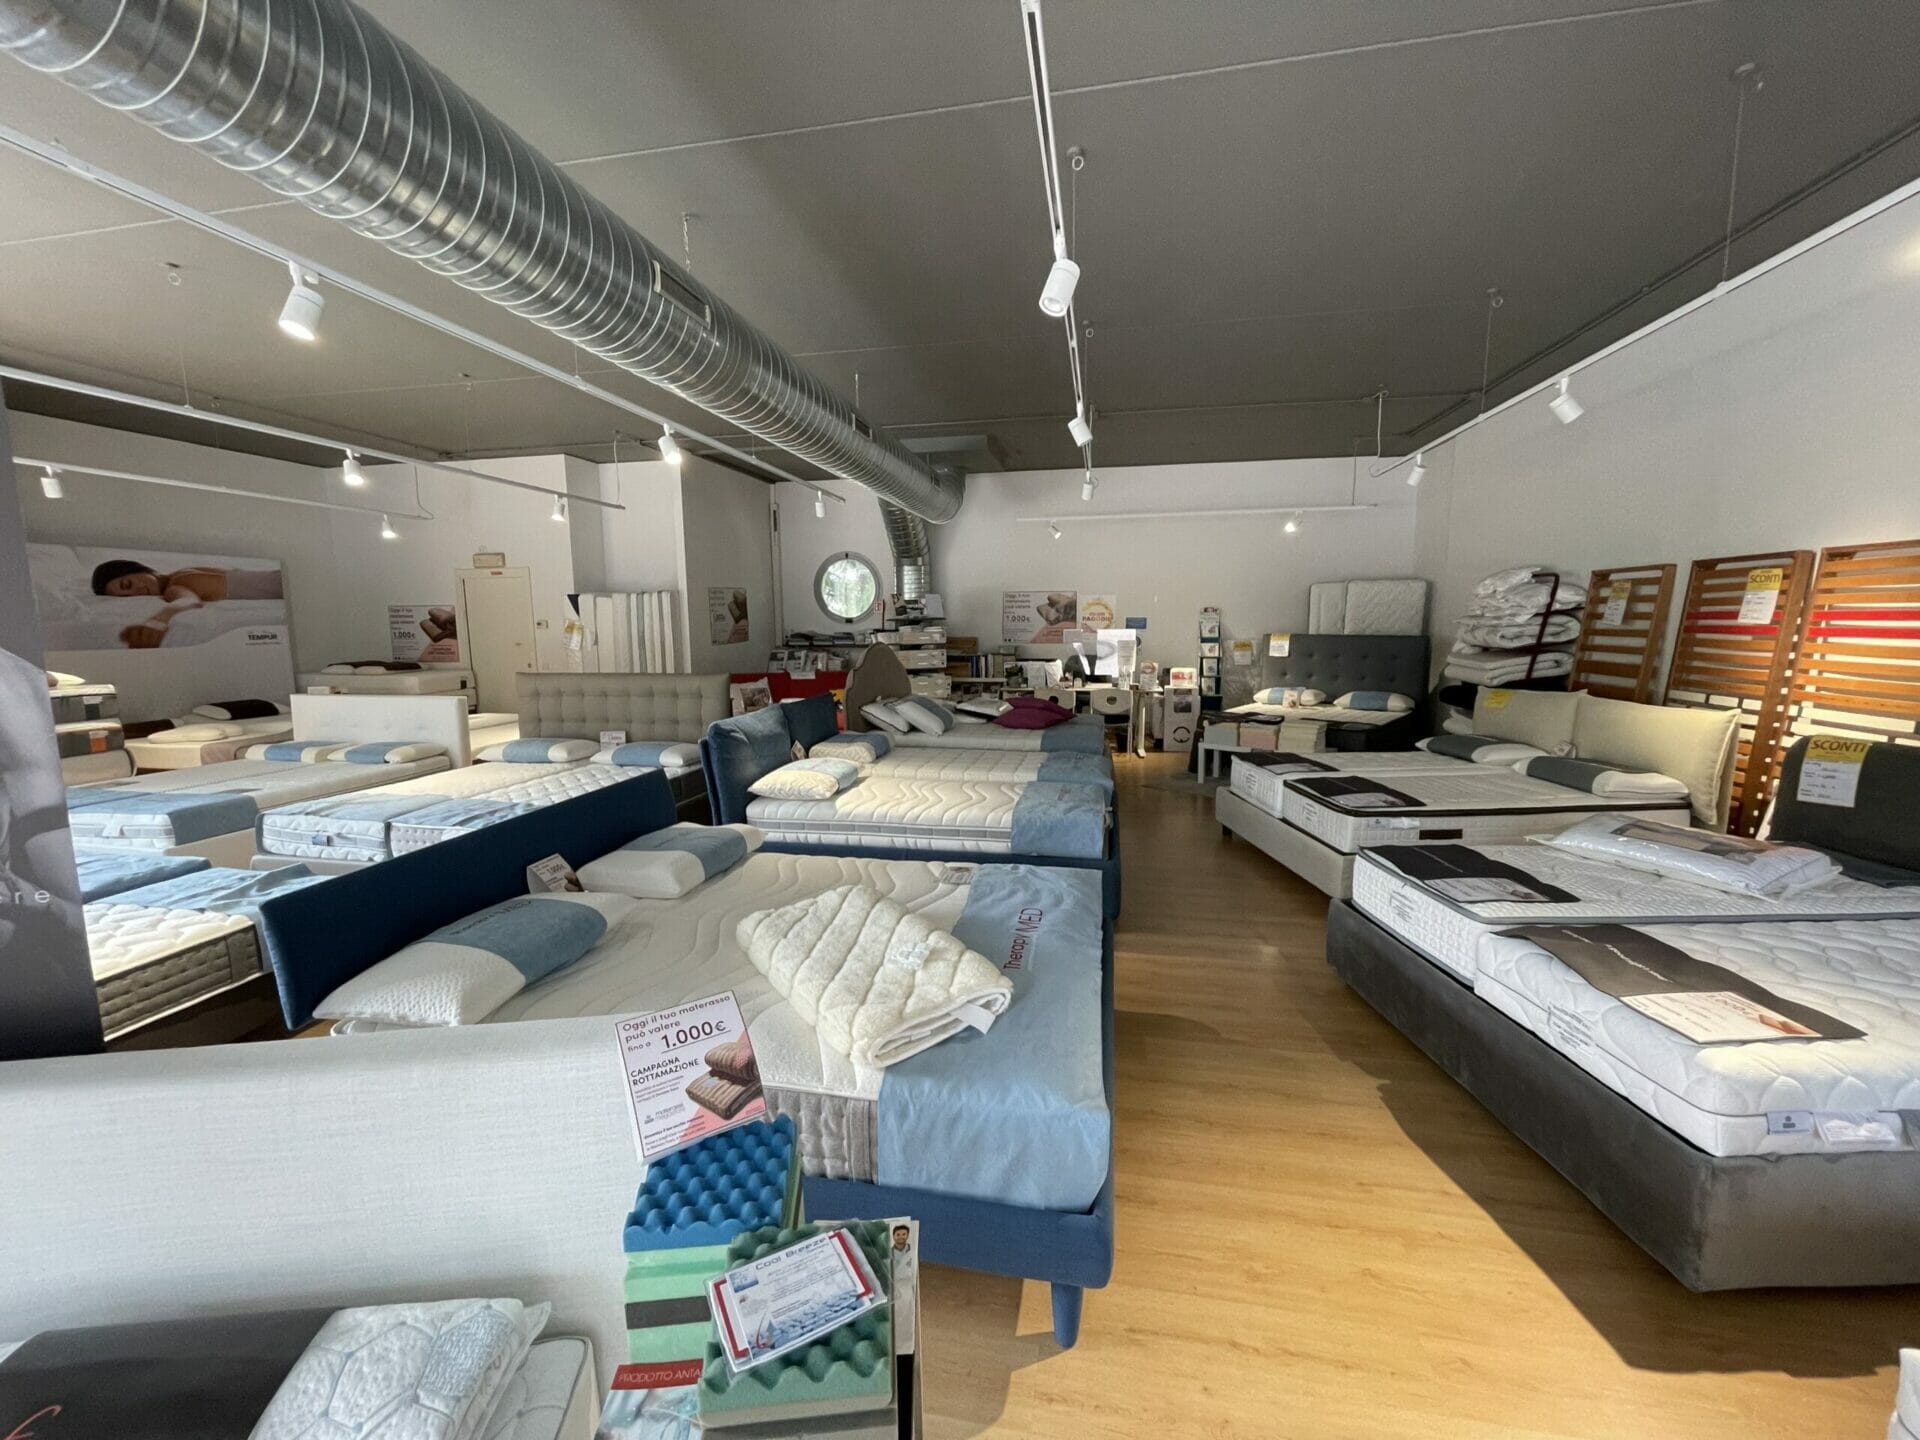 Materassimegastore Punto vendita Varese Via Caracciolo 8